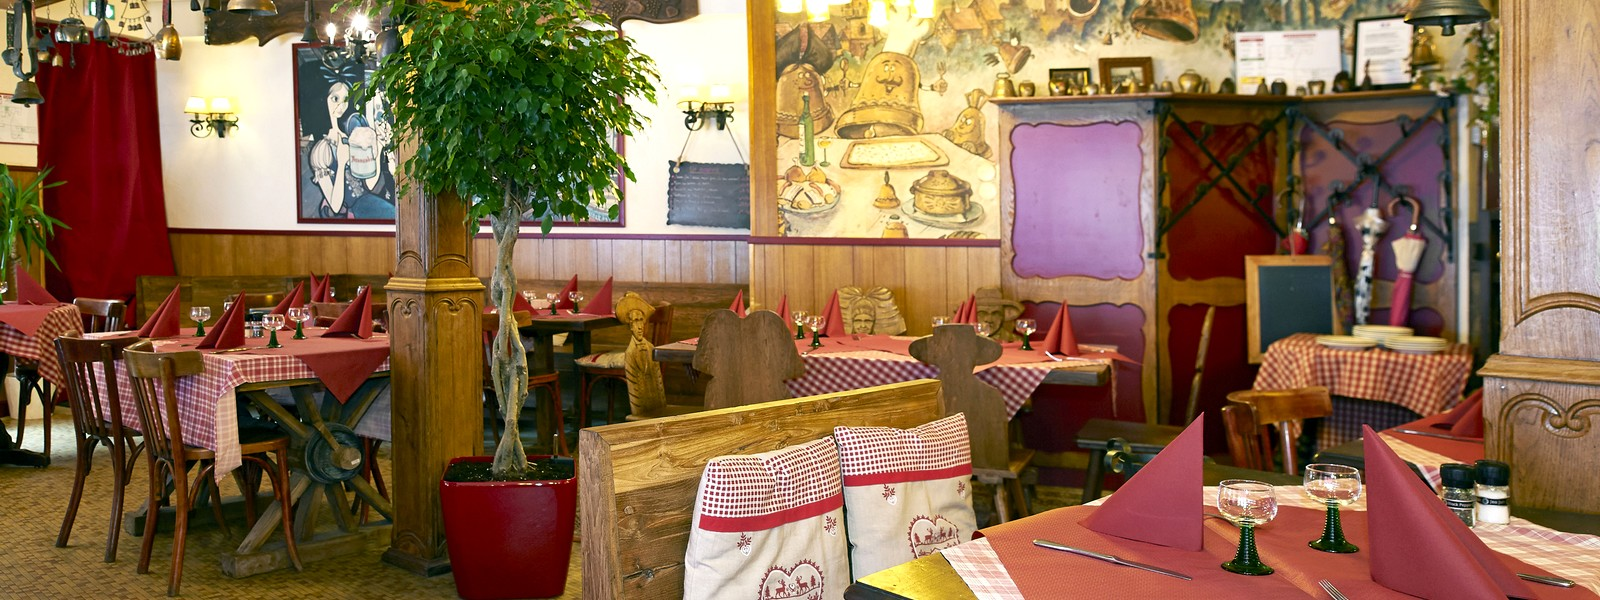 salle-restaurant-obernai